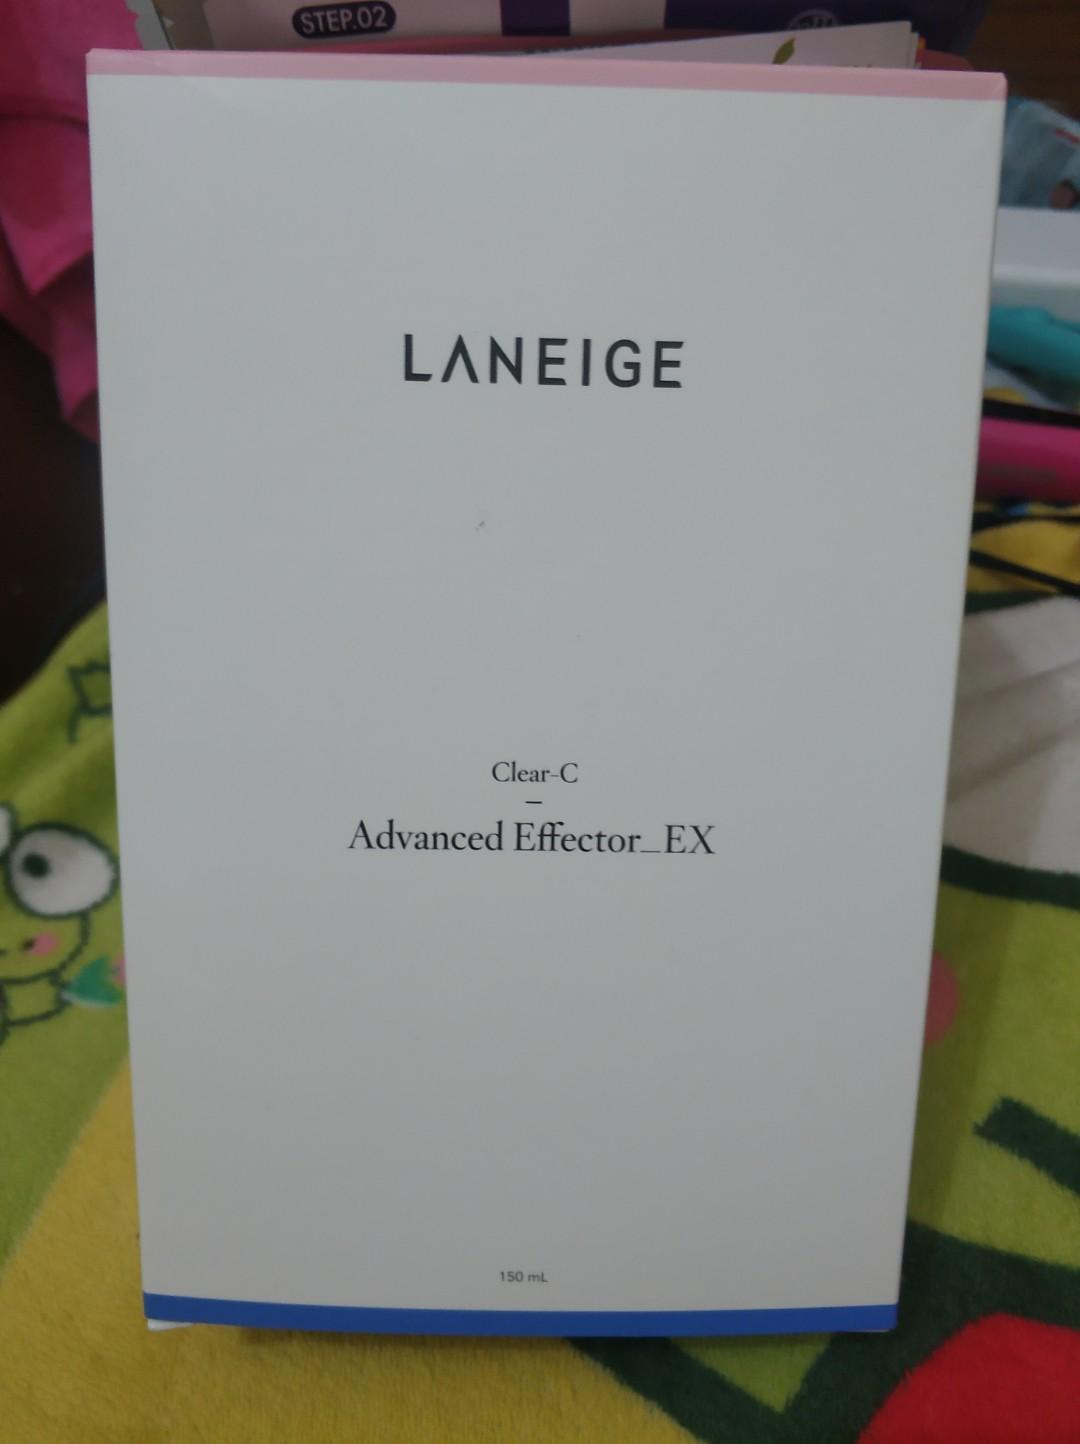 SALE LANEIGE CLEAR C EFFECTOR EX TONER